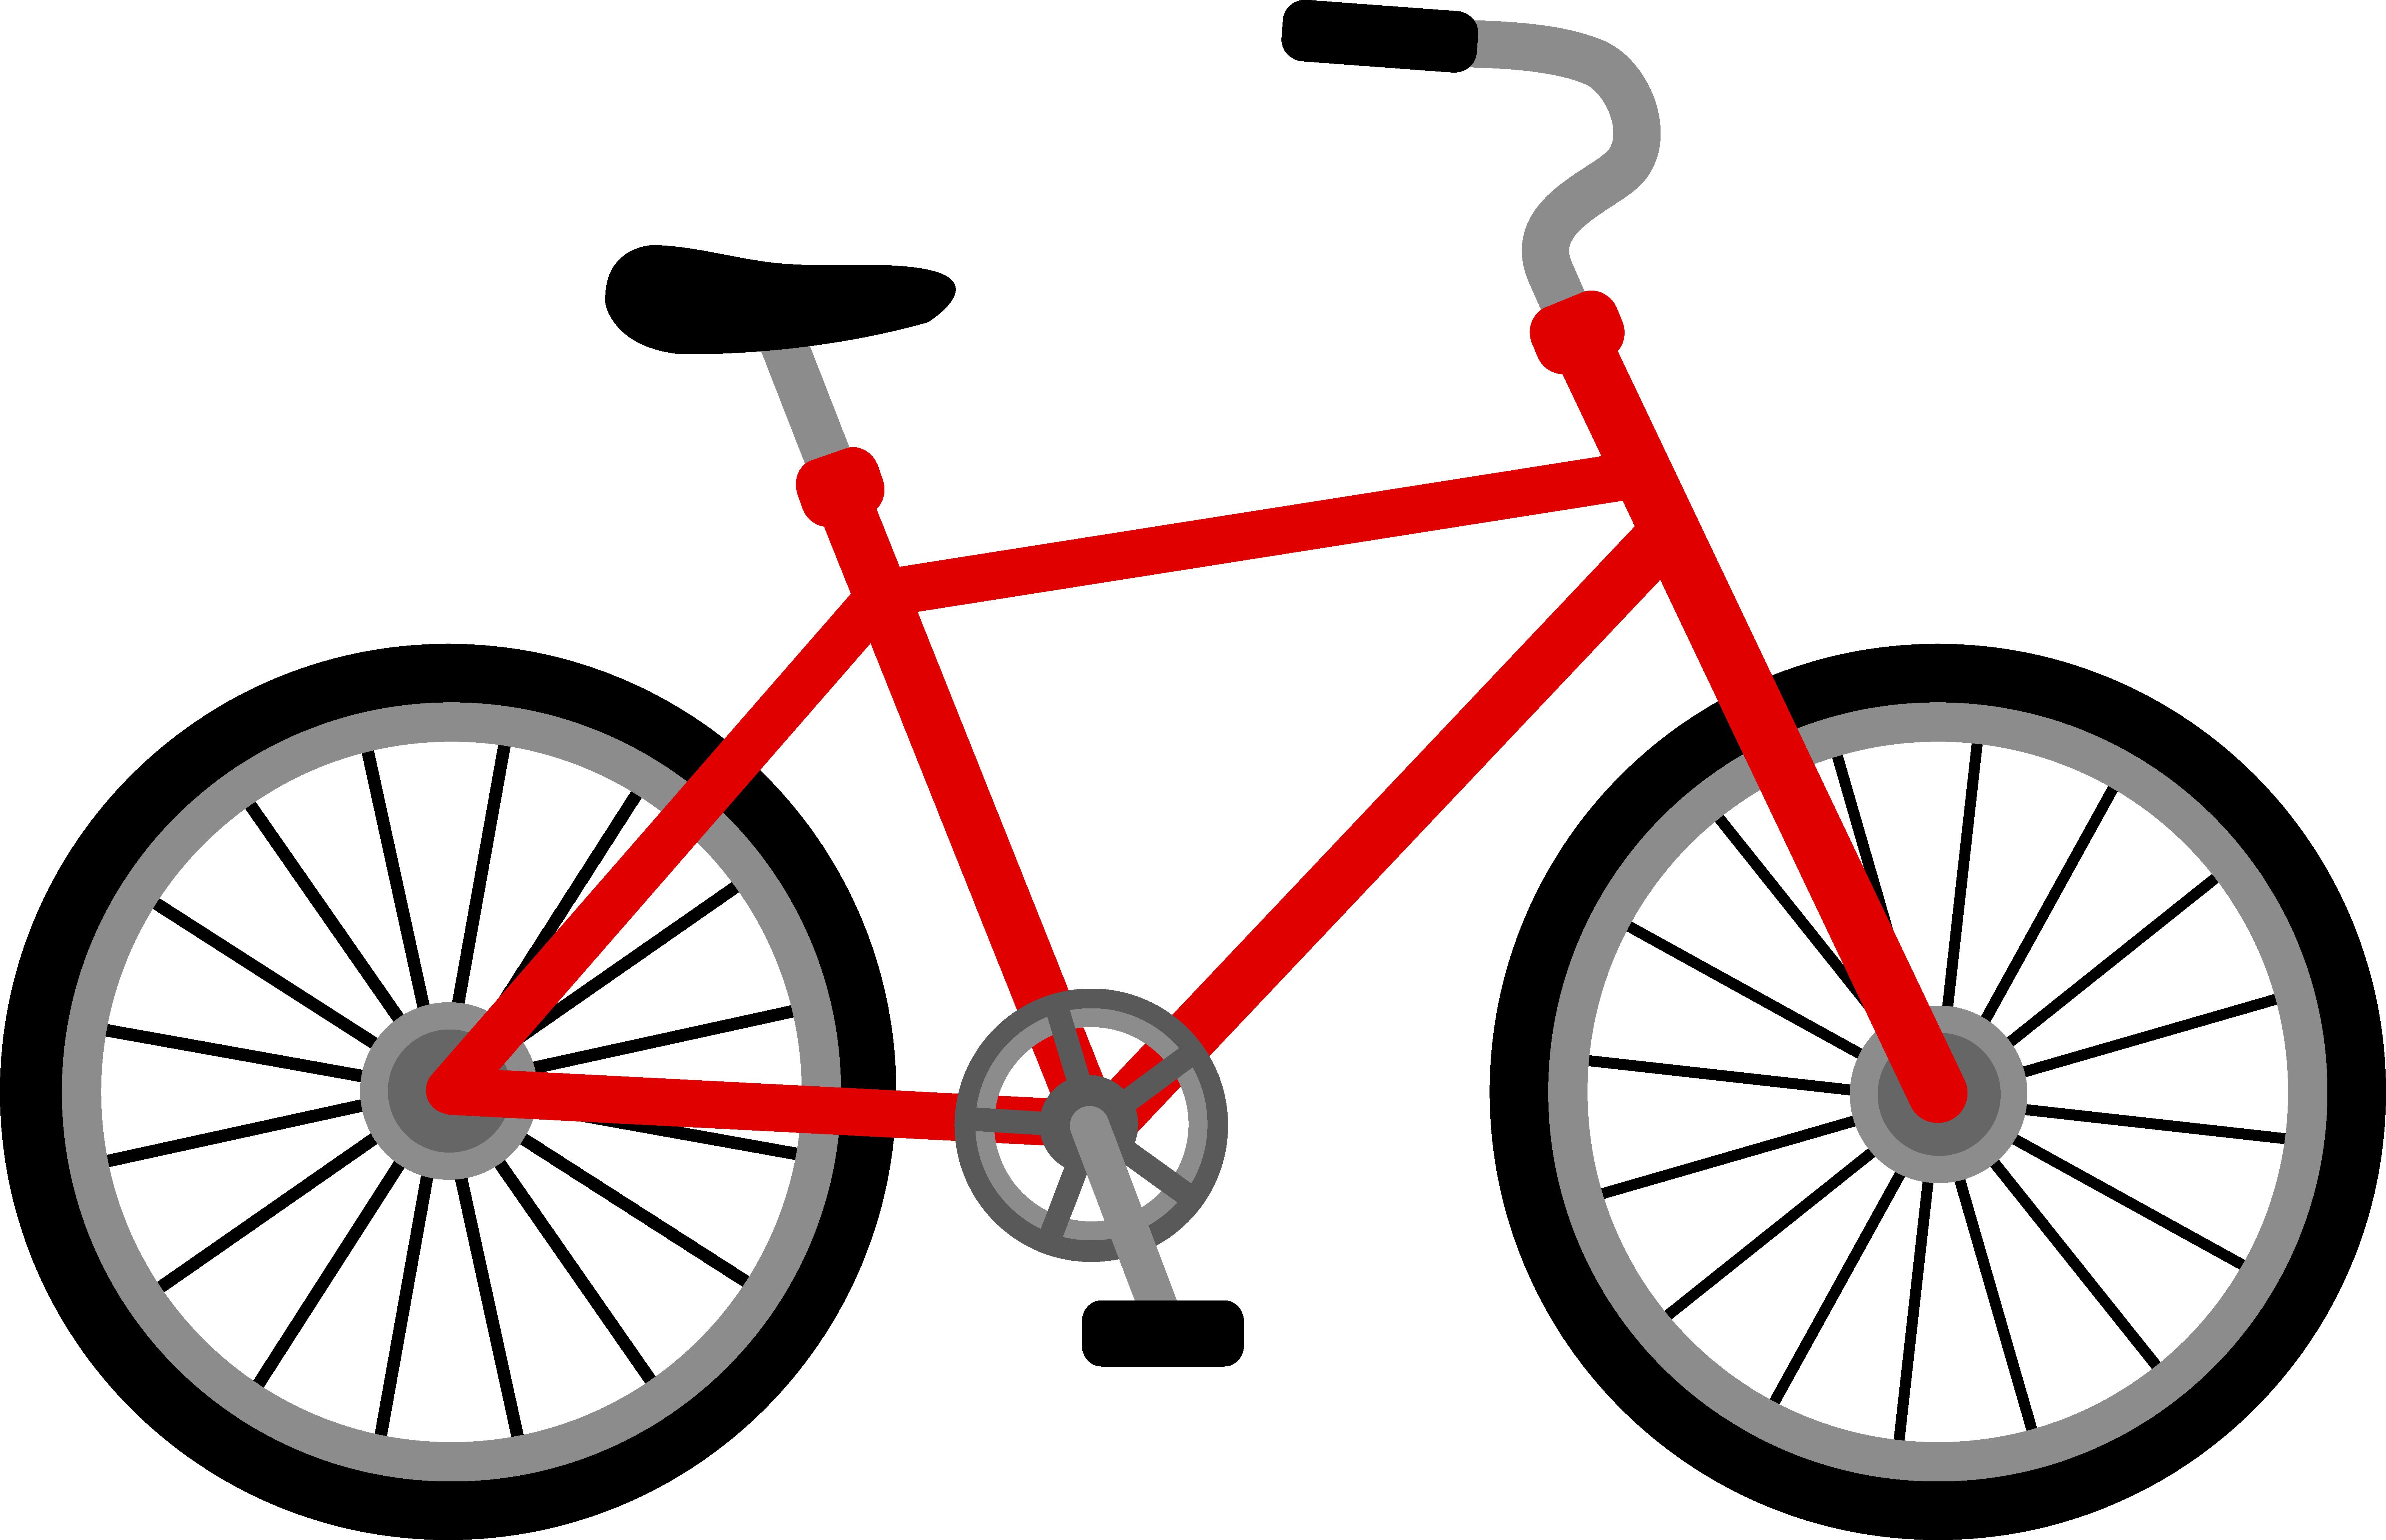 Cycle Clipart U0026middot; Bike Clipart-cycle clipart u0026middot; bike clipart-16